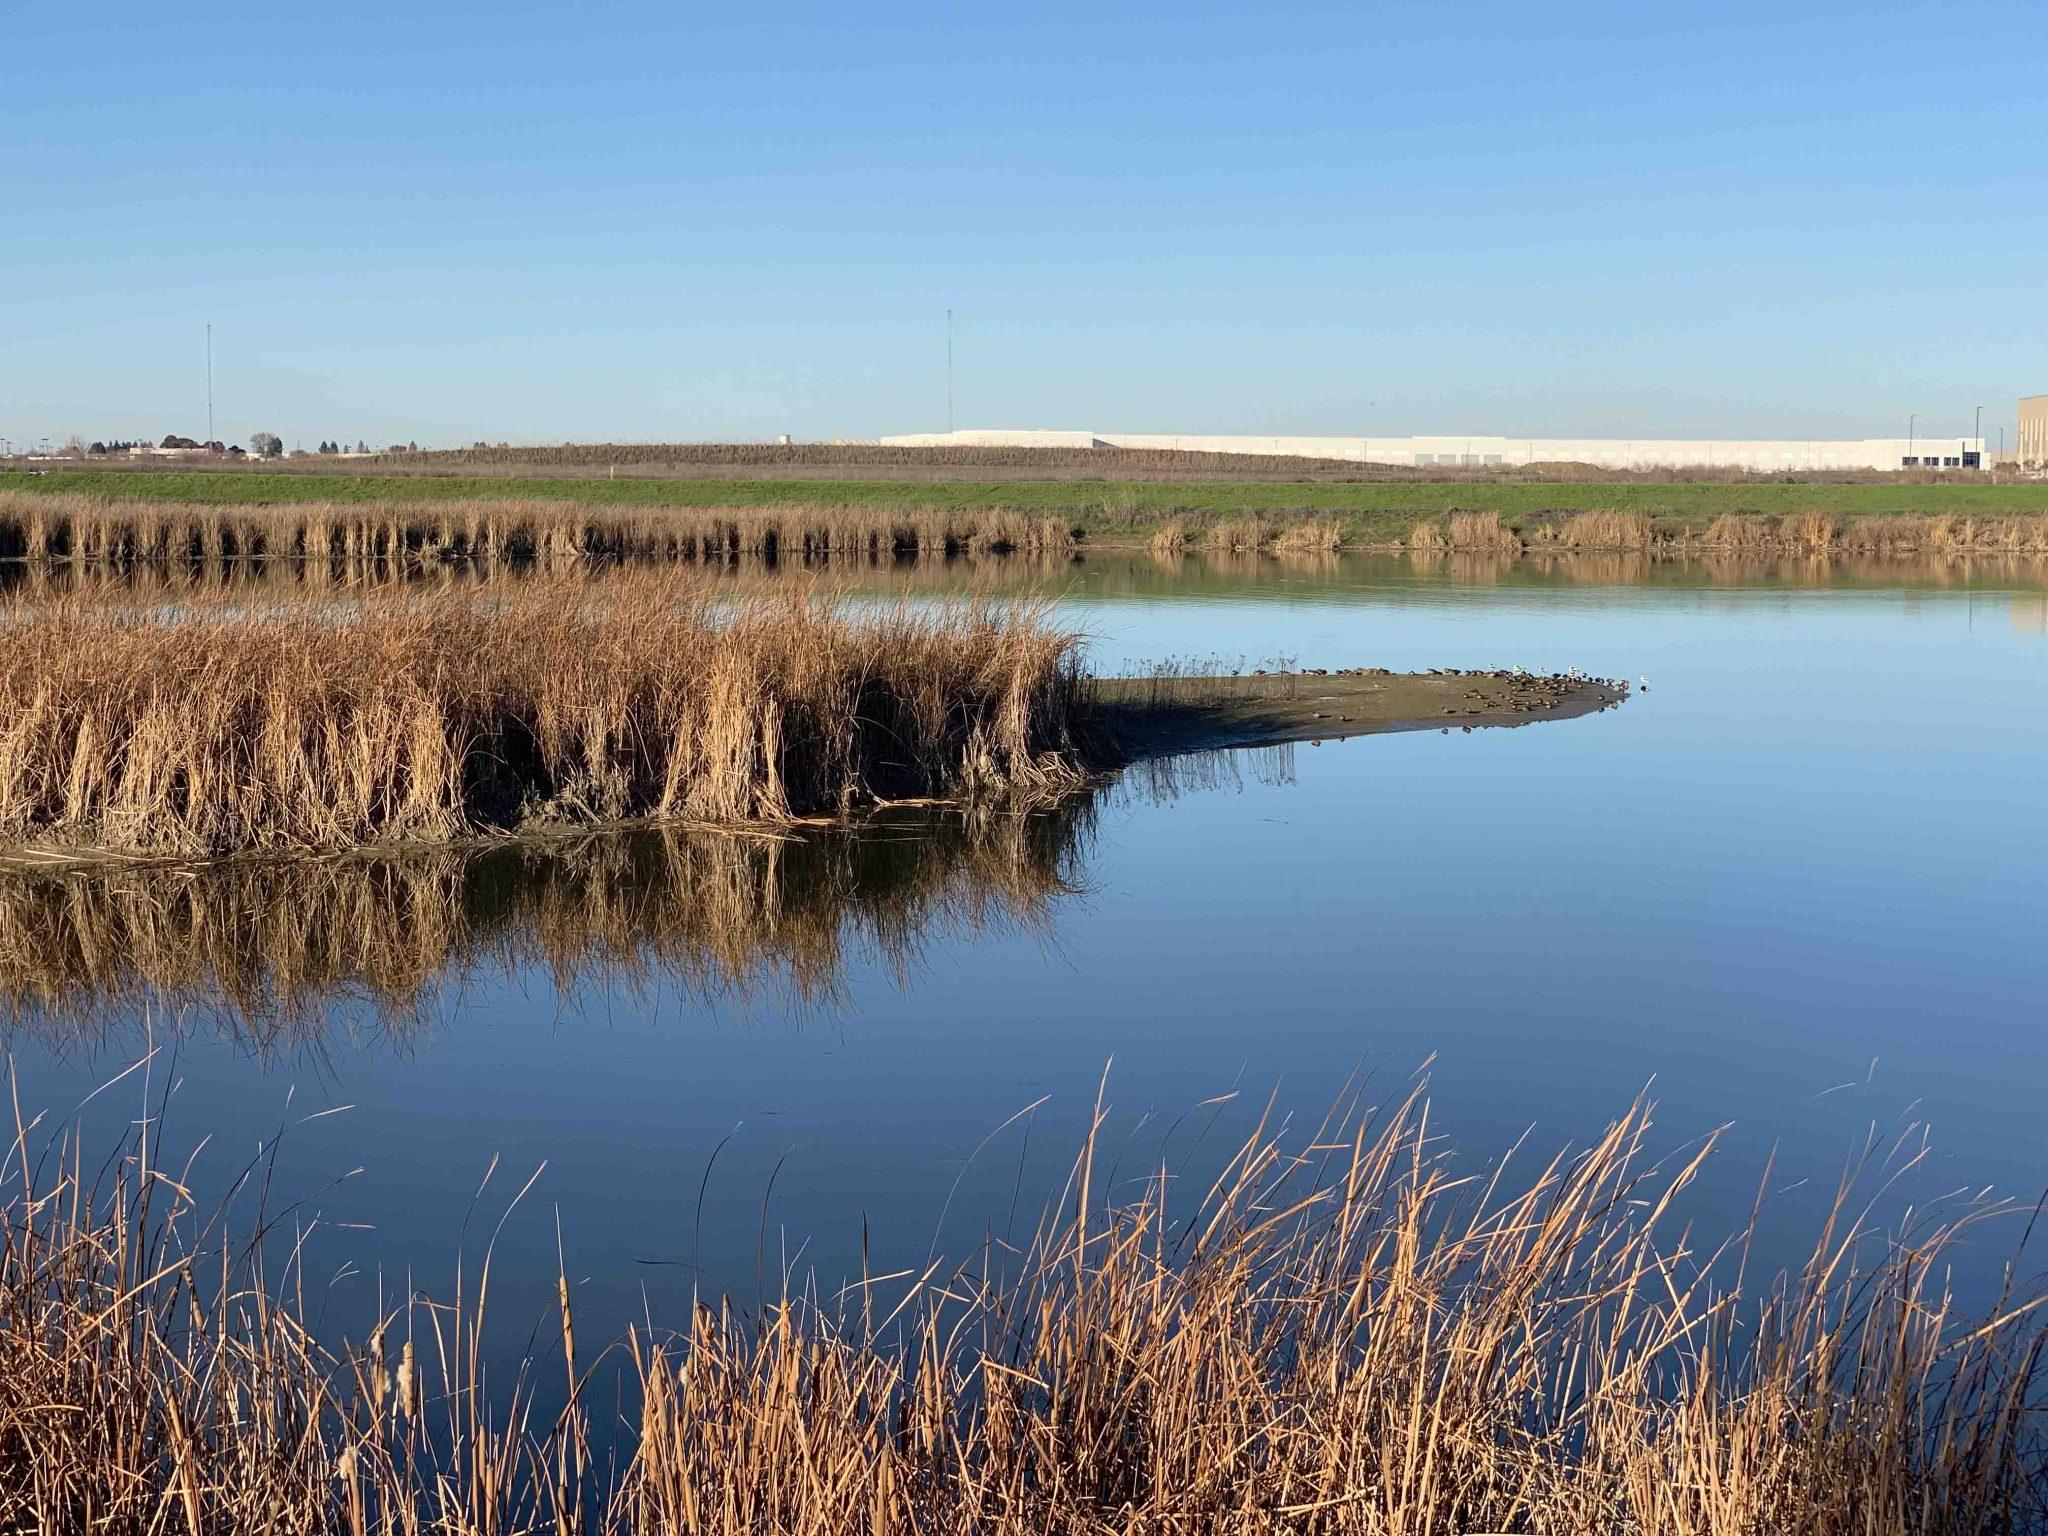 Bridgeway Island Pond meets Industrial Development